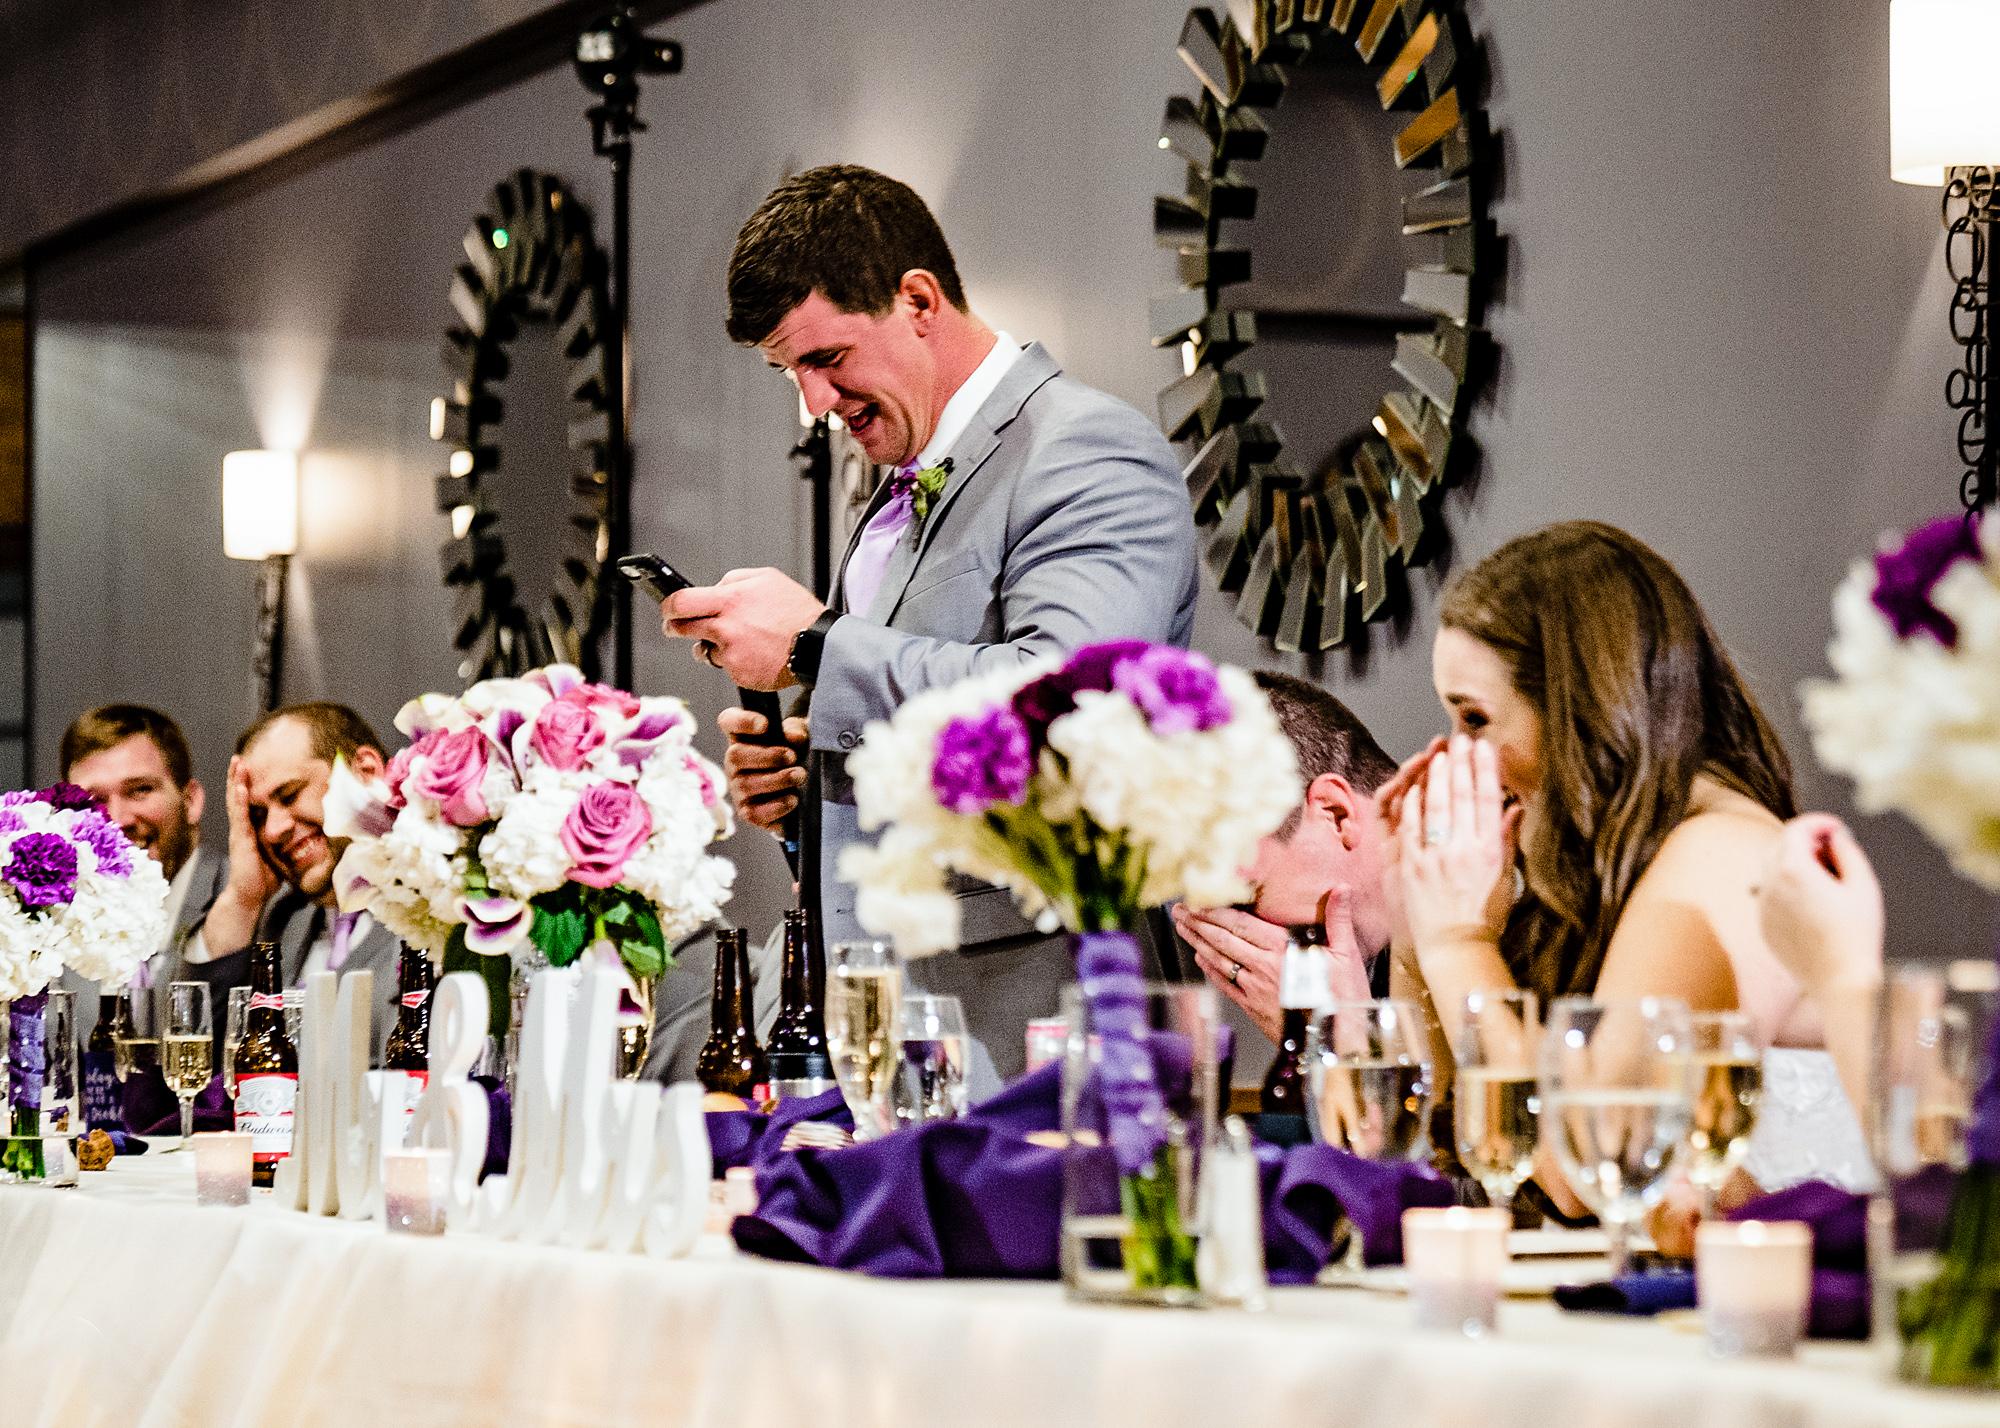 The-Pinnacle-Ballroom-Covington-KY-Wedding-Photography-14.jpg